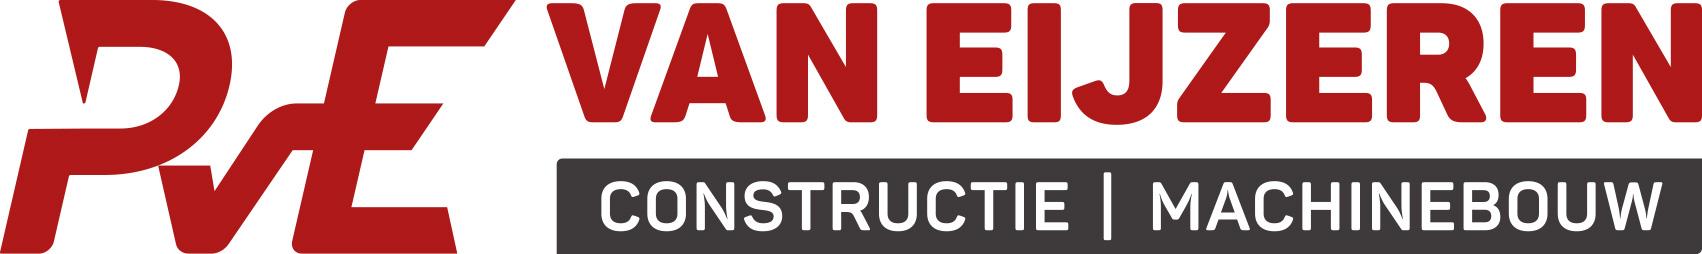 pve_machinebouw_constructie